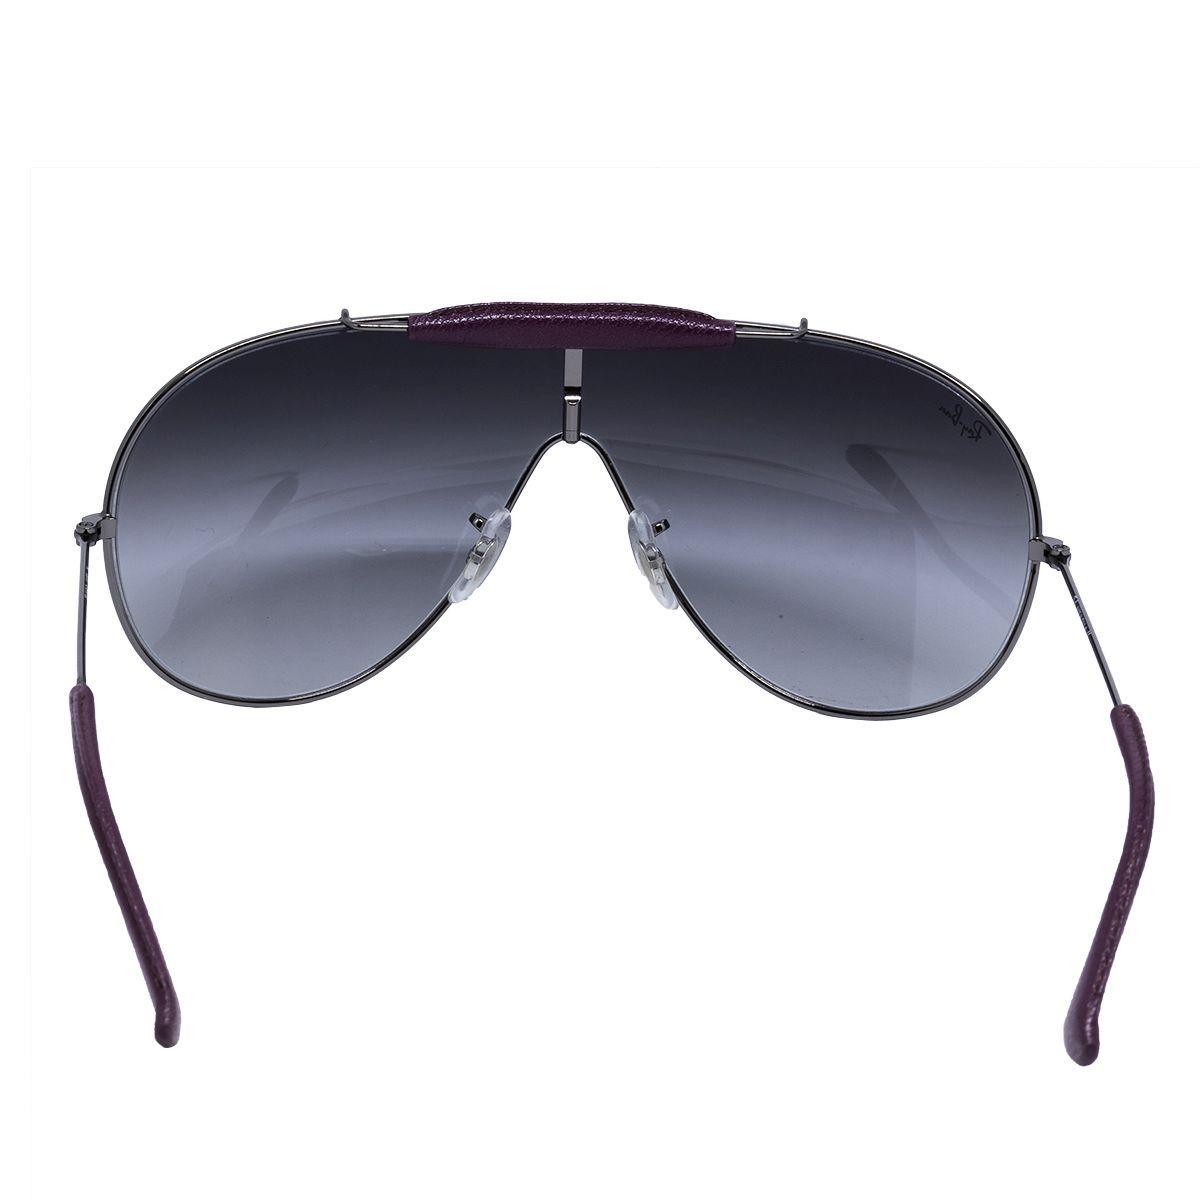 Óculos de Sol Ray Ban Máscara RB3416 - Metal Prata, Lente Cinza Degradê R   657,00 à vista. Adicionar à sacola befa66942e